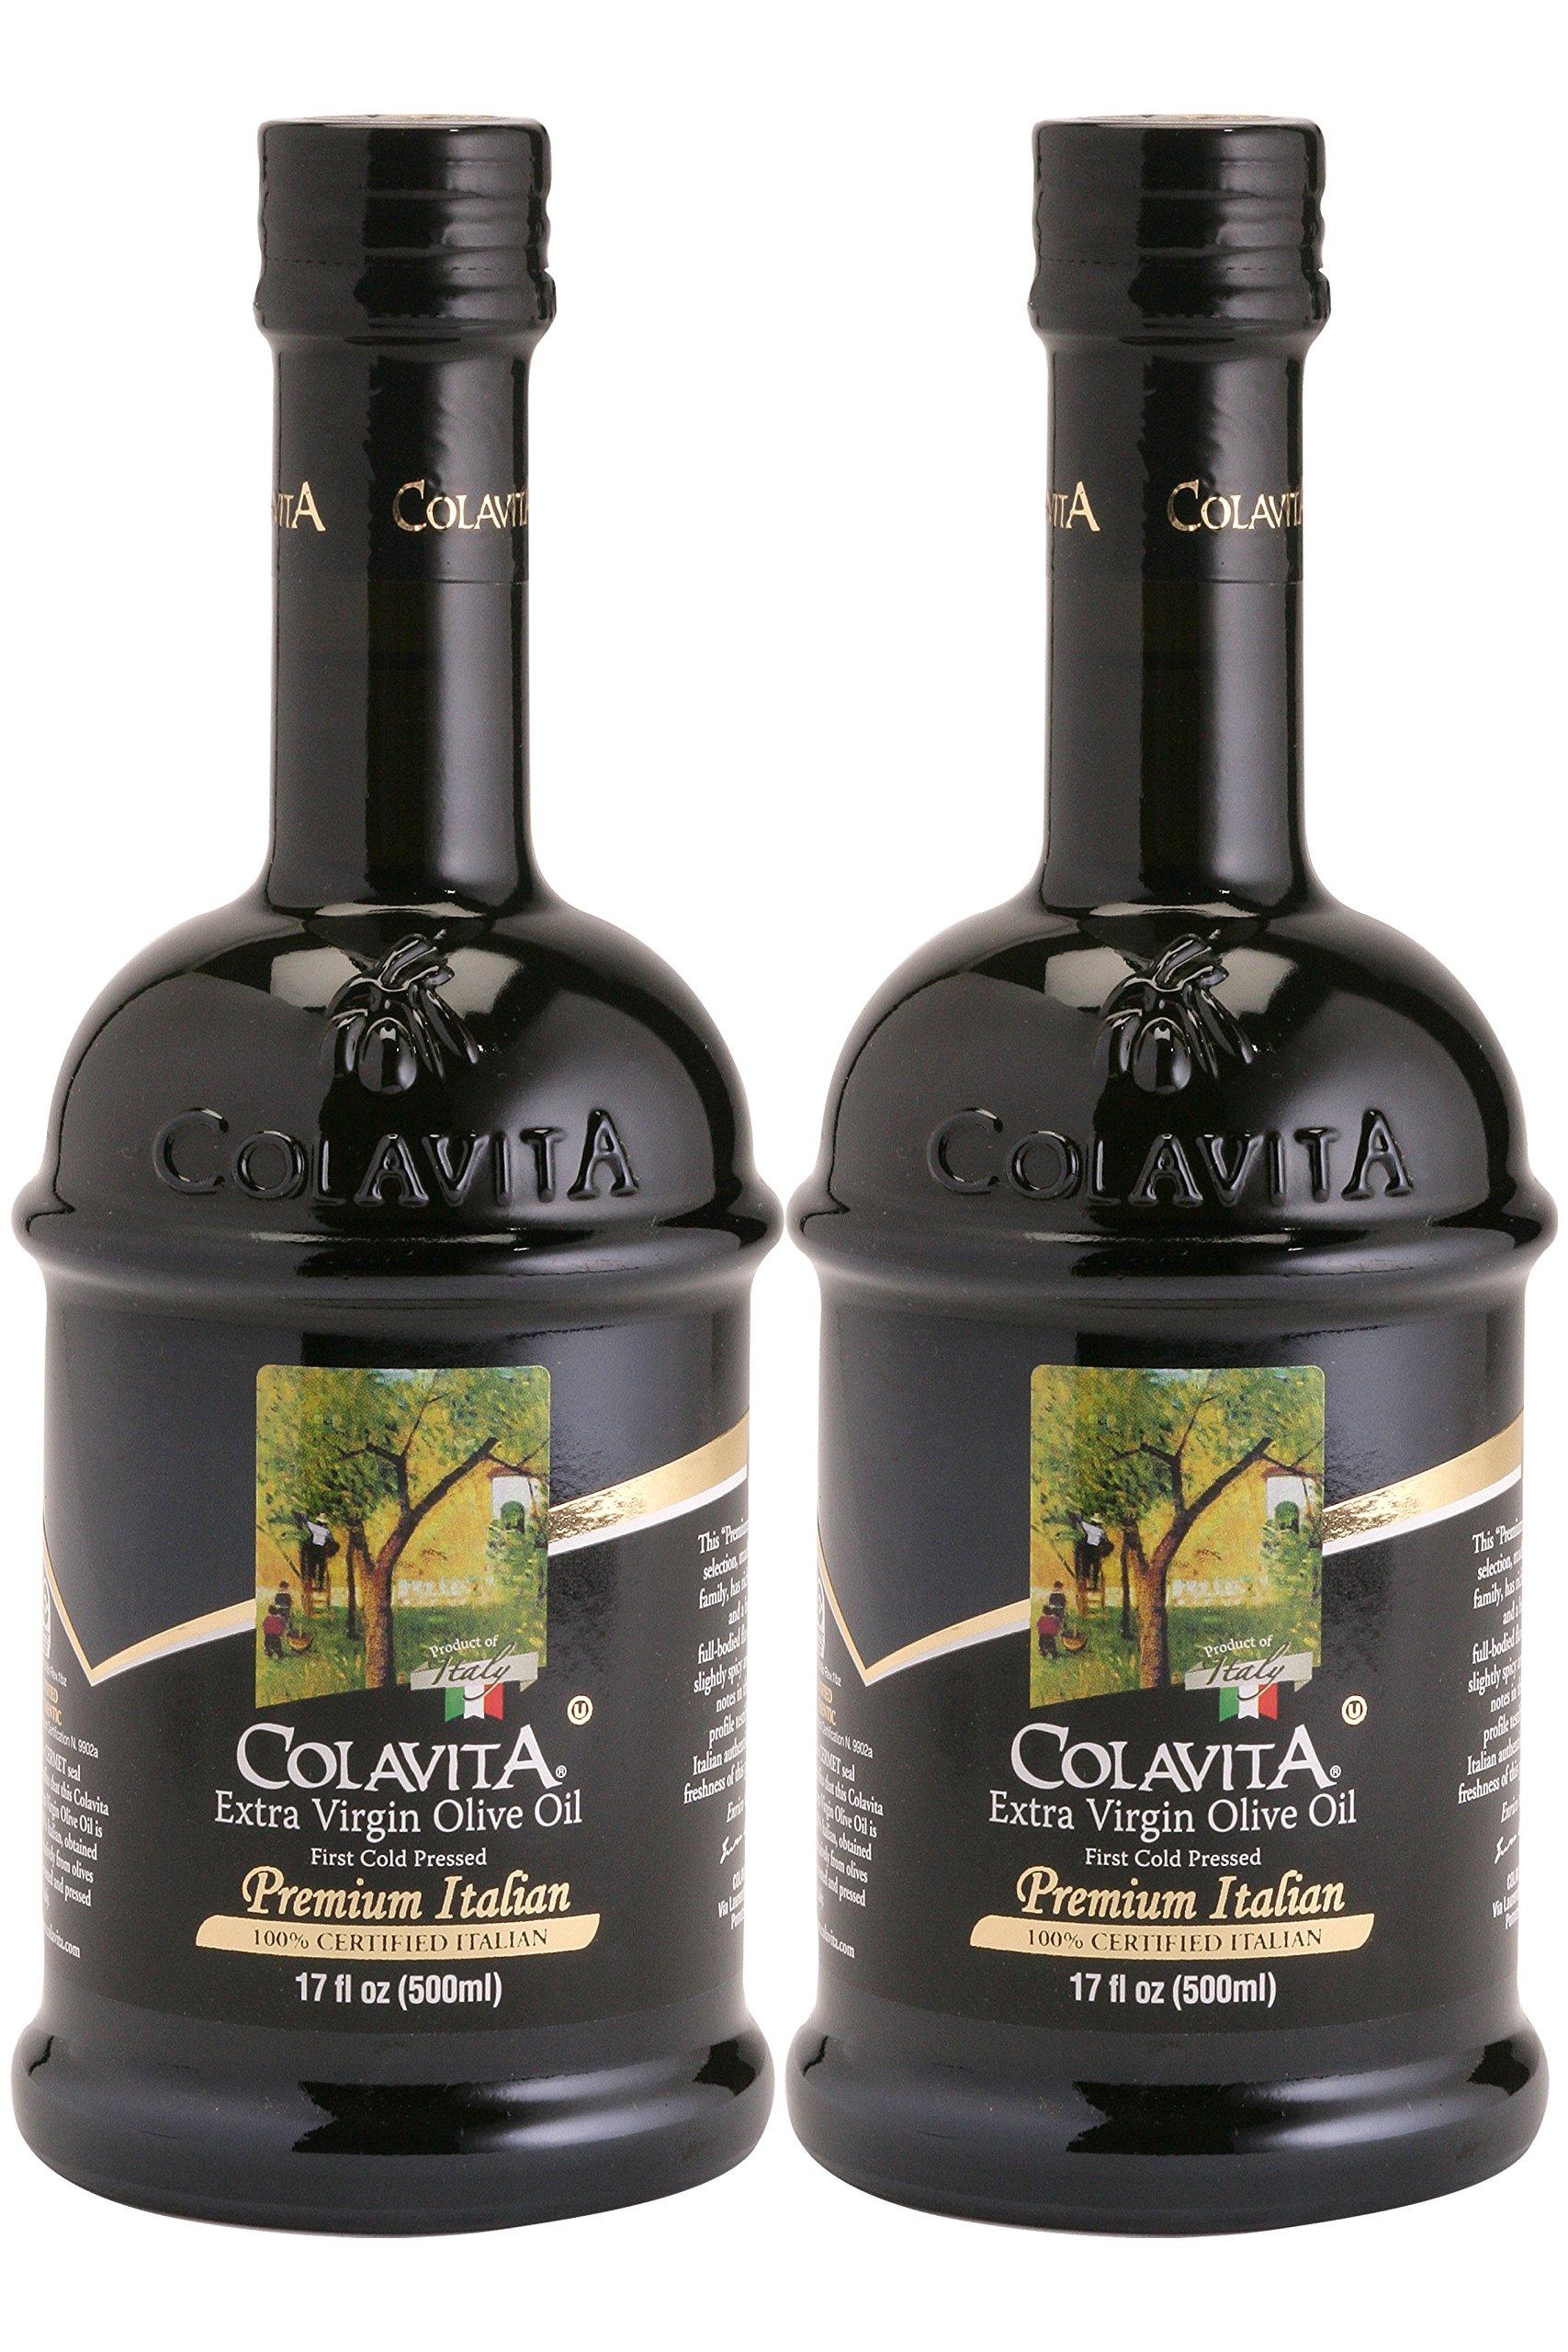 Colavita Premium Italian Extra Virgin Olive Oil, 17 Ounce (Pack of 2)